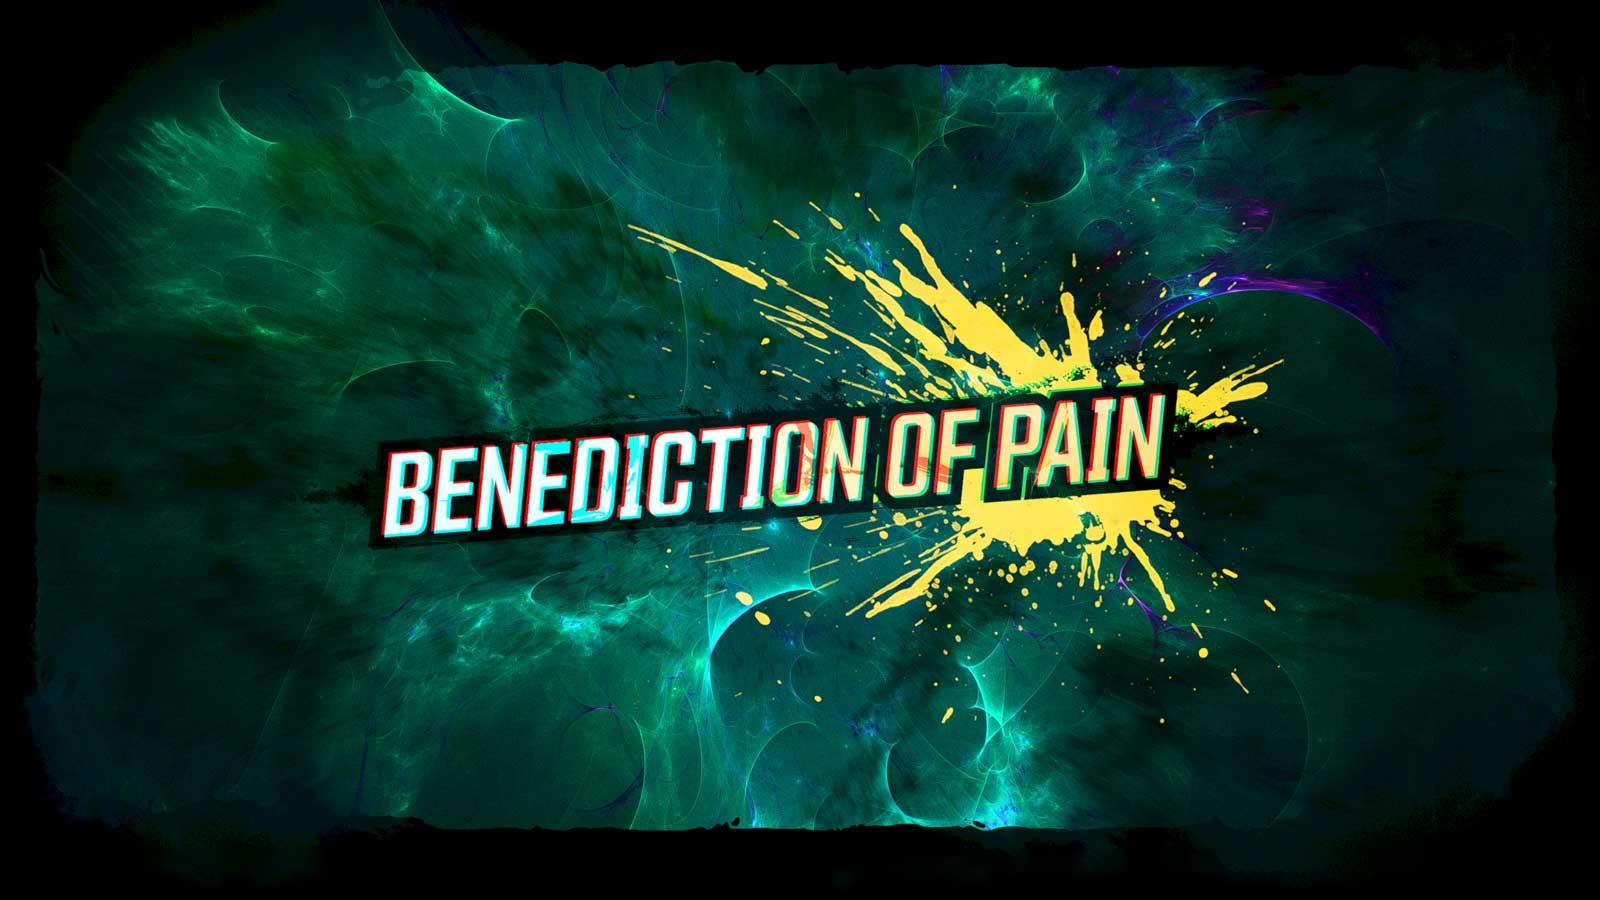 Benediction of Pain